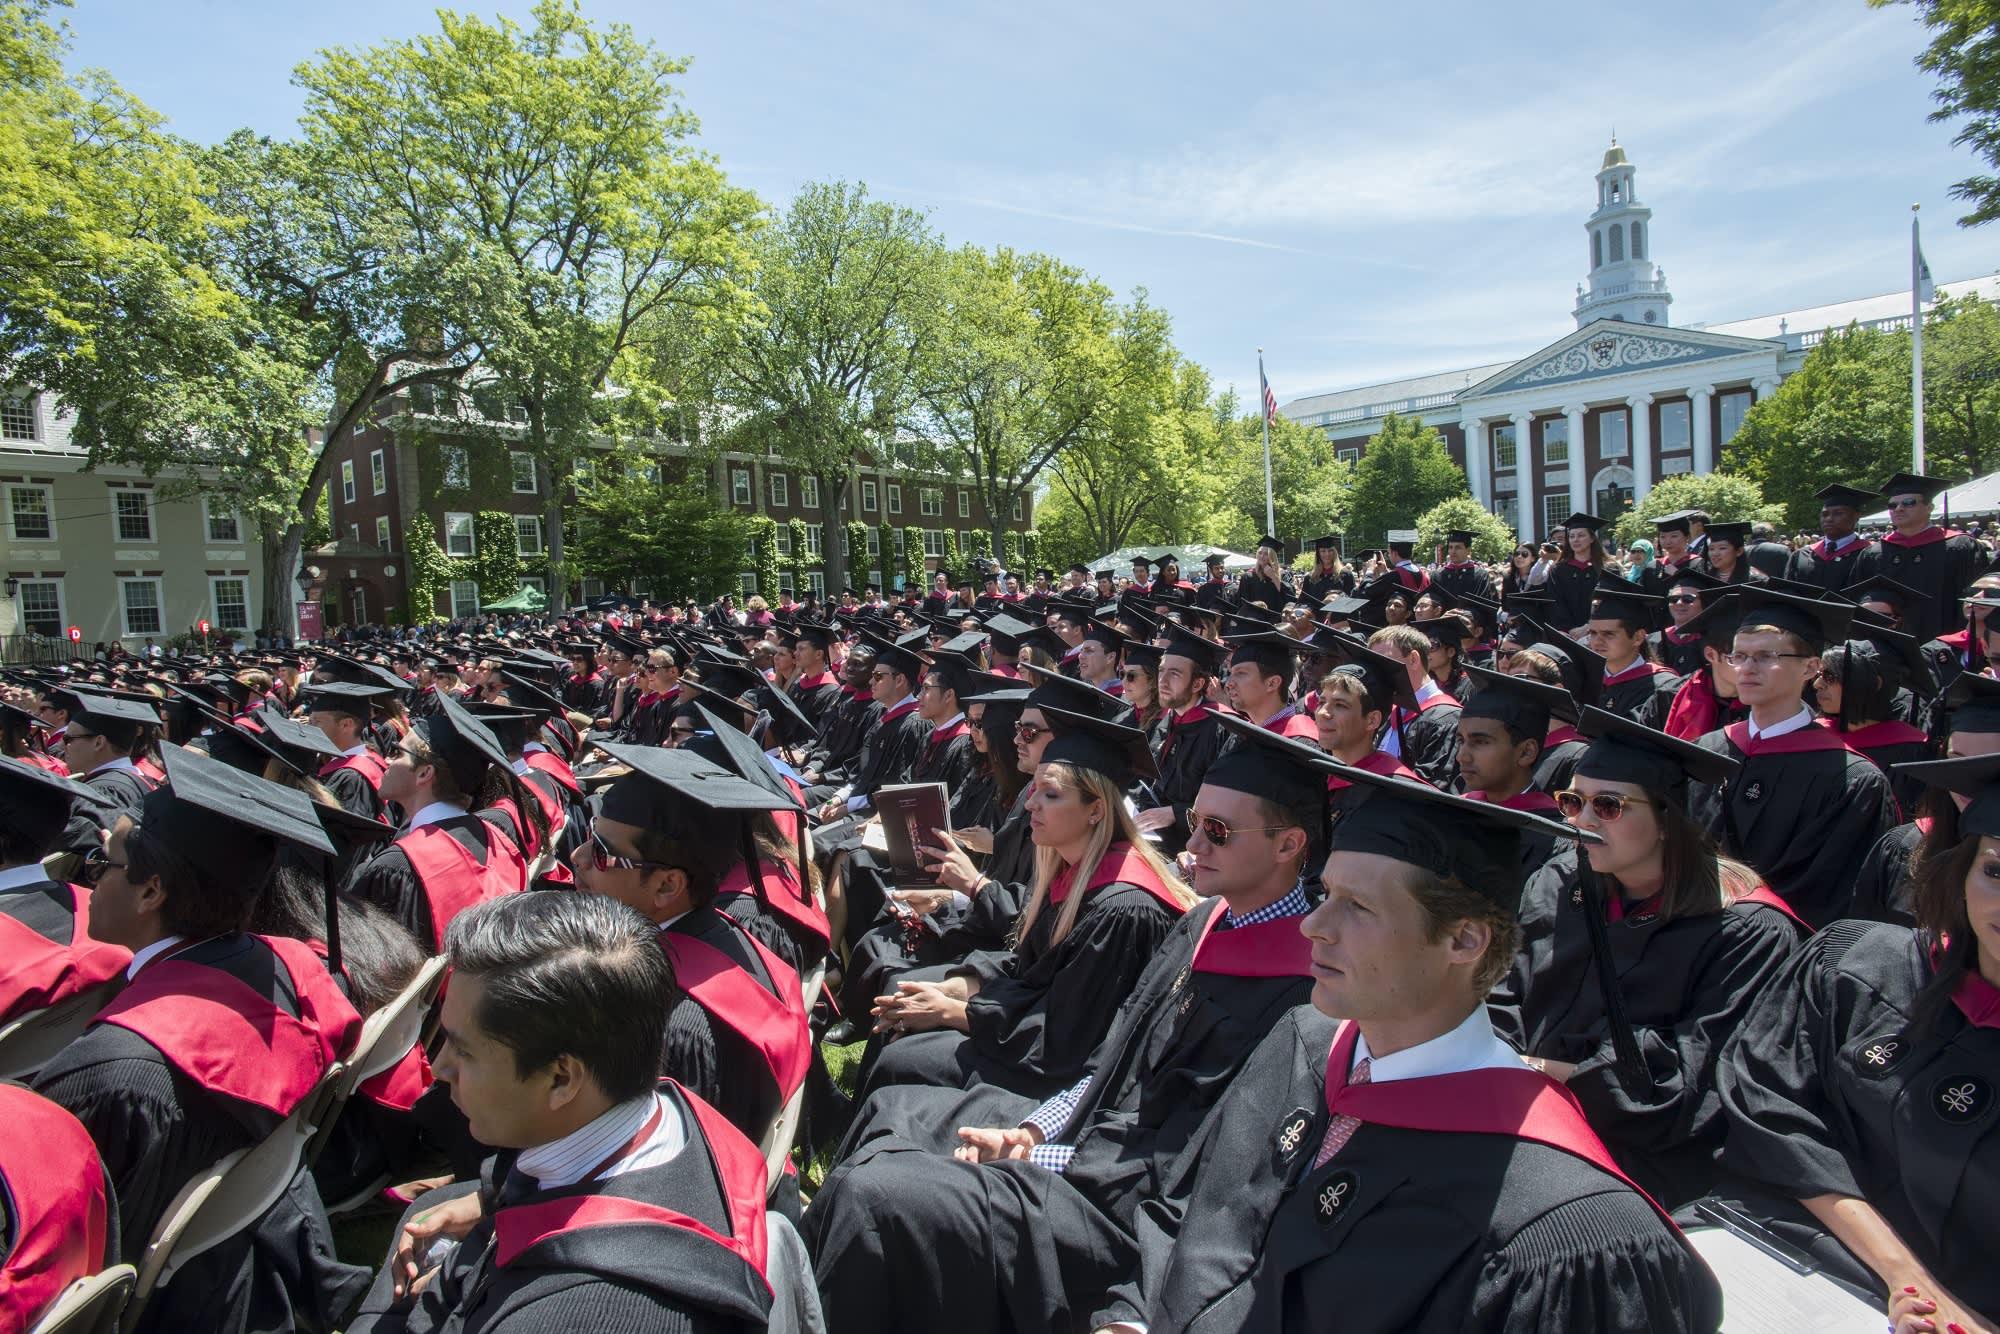 Harvard's endowment is worth $40 billion—here's how it's spent